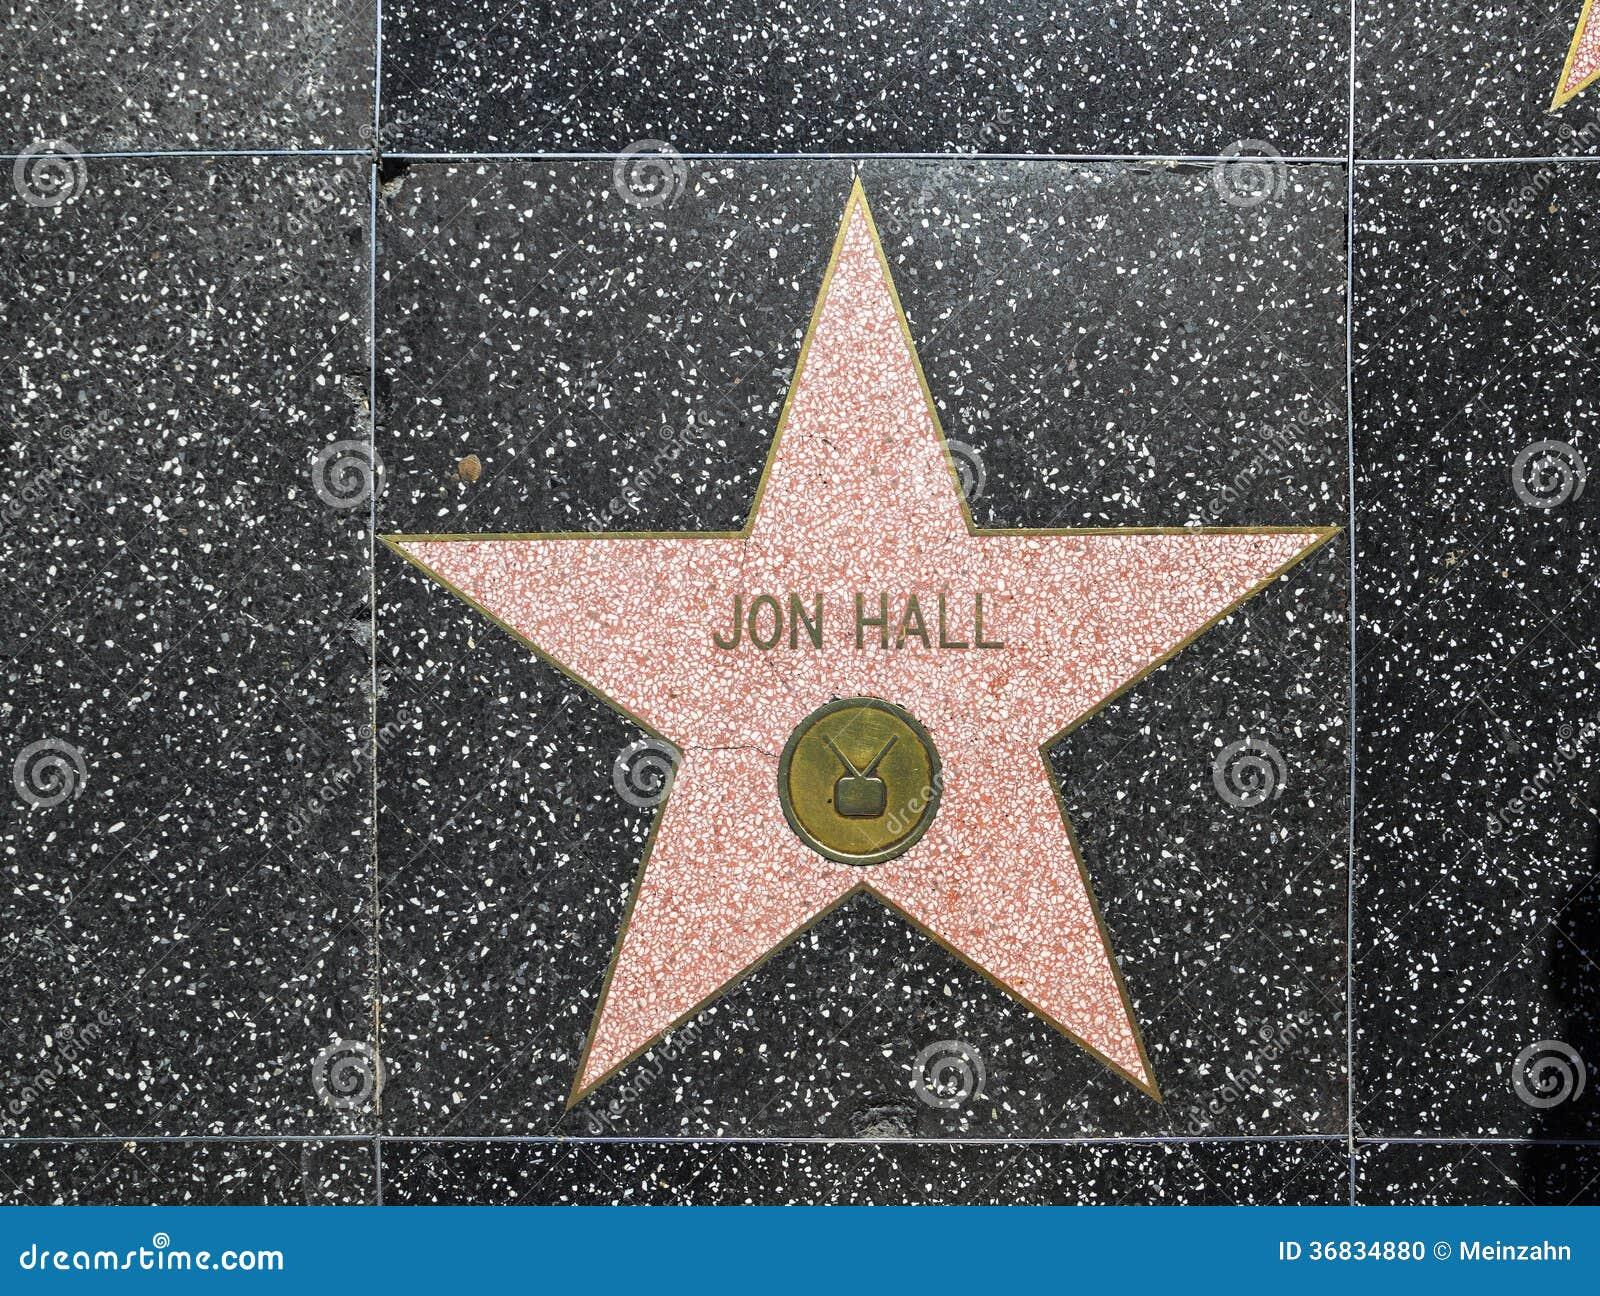 Jon Hall S Star On Hollywood Walk Editorial Image Image